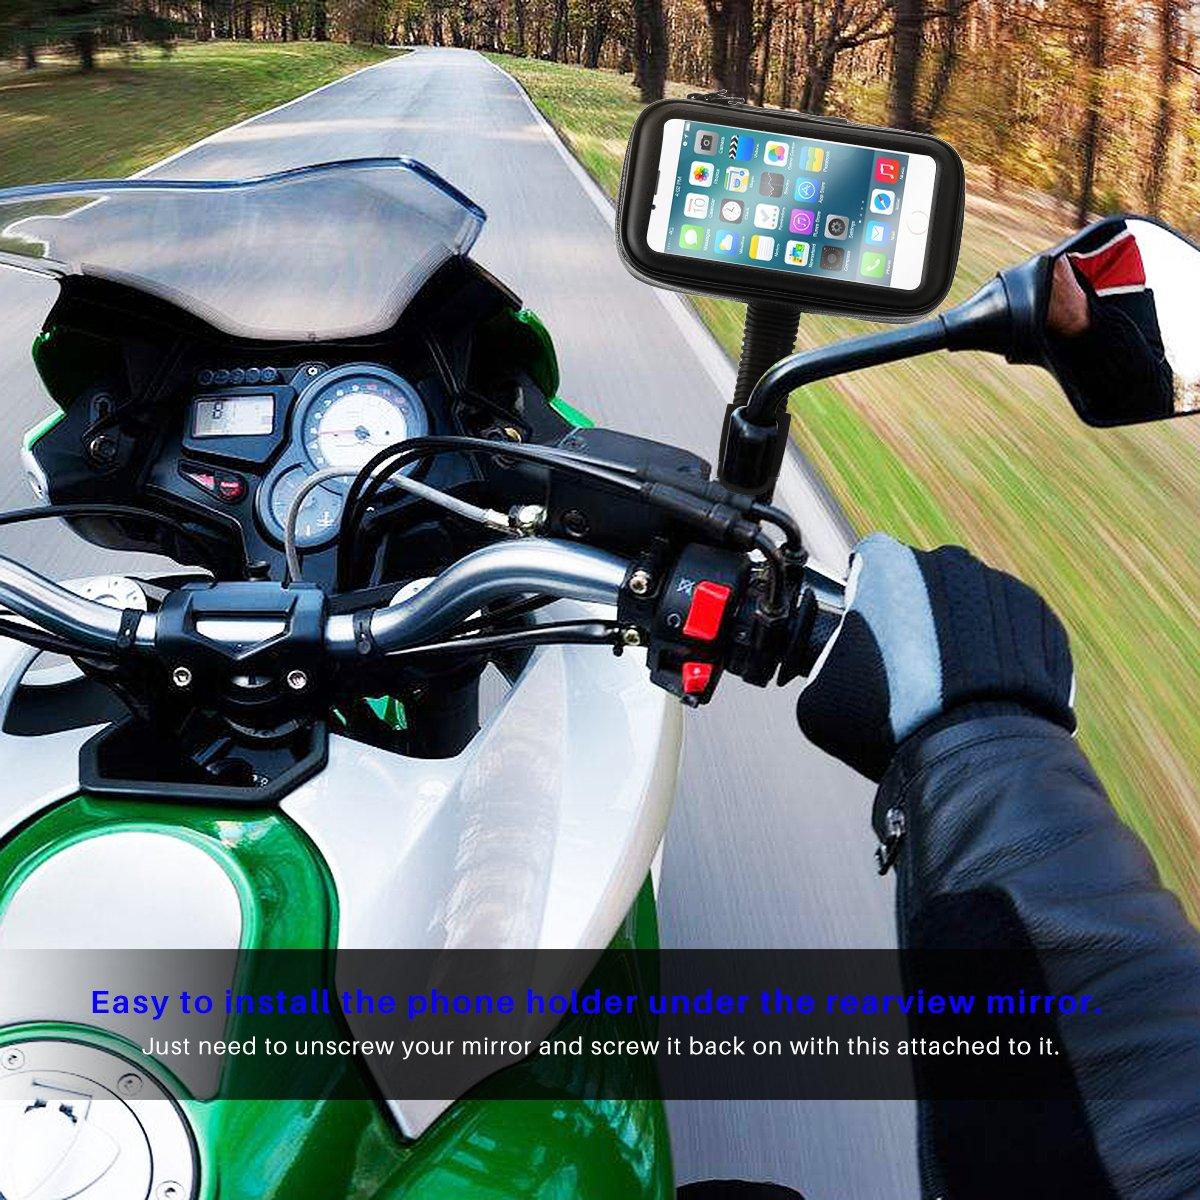 HITECHLIFE HITECHLIFE Motocicleta Soporte para tel/éfono m/óvil Bolsa Impermeable Ventana Transparente Operable Pantalla t/áctil